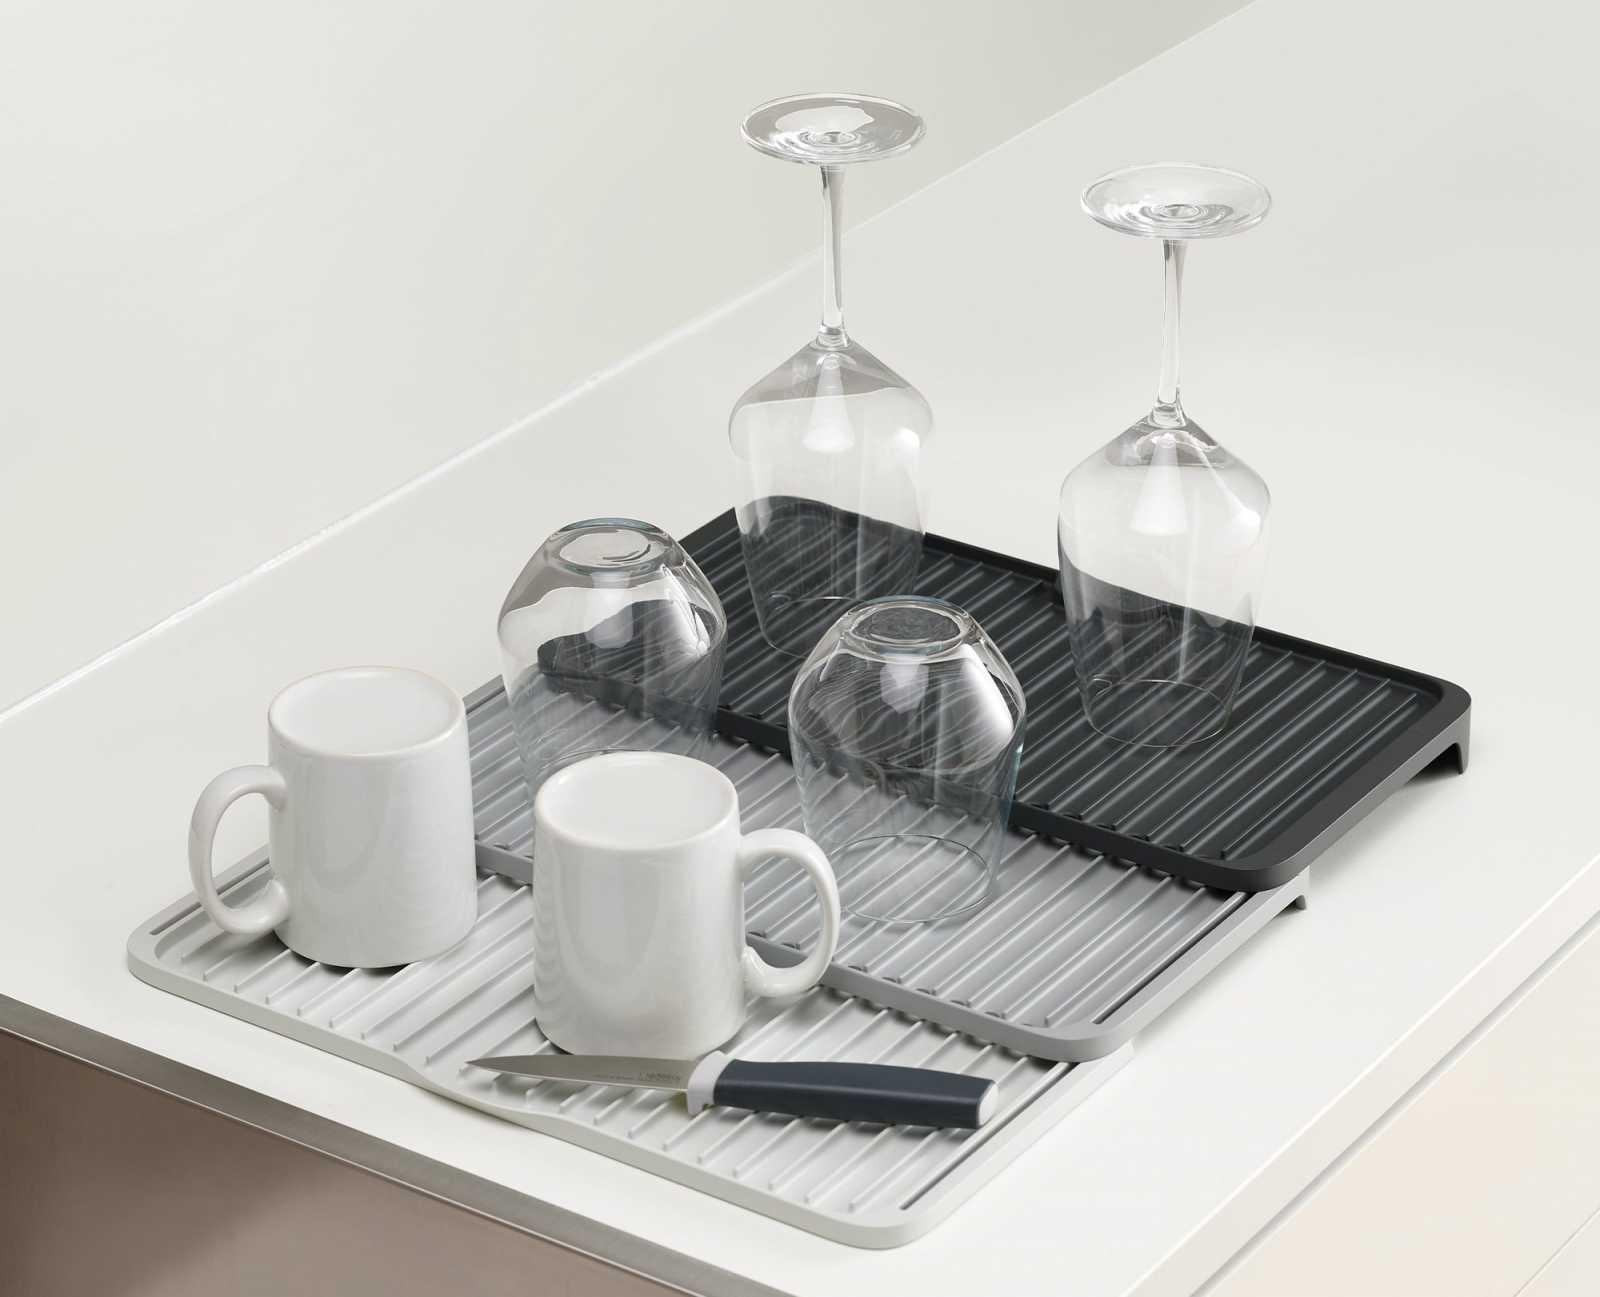 Коврик для сушки посуды раскладной Joseph Joseph Tier™, серый Joseph Joseph 85178 фото 1